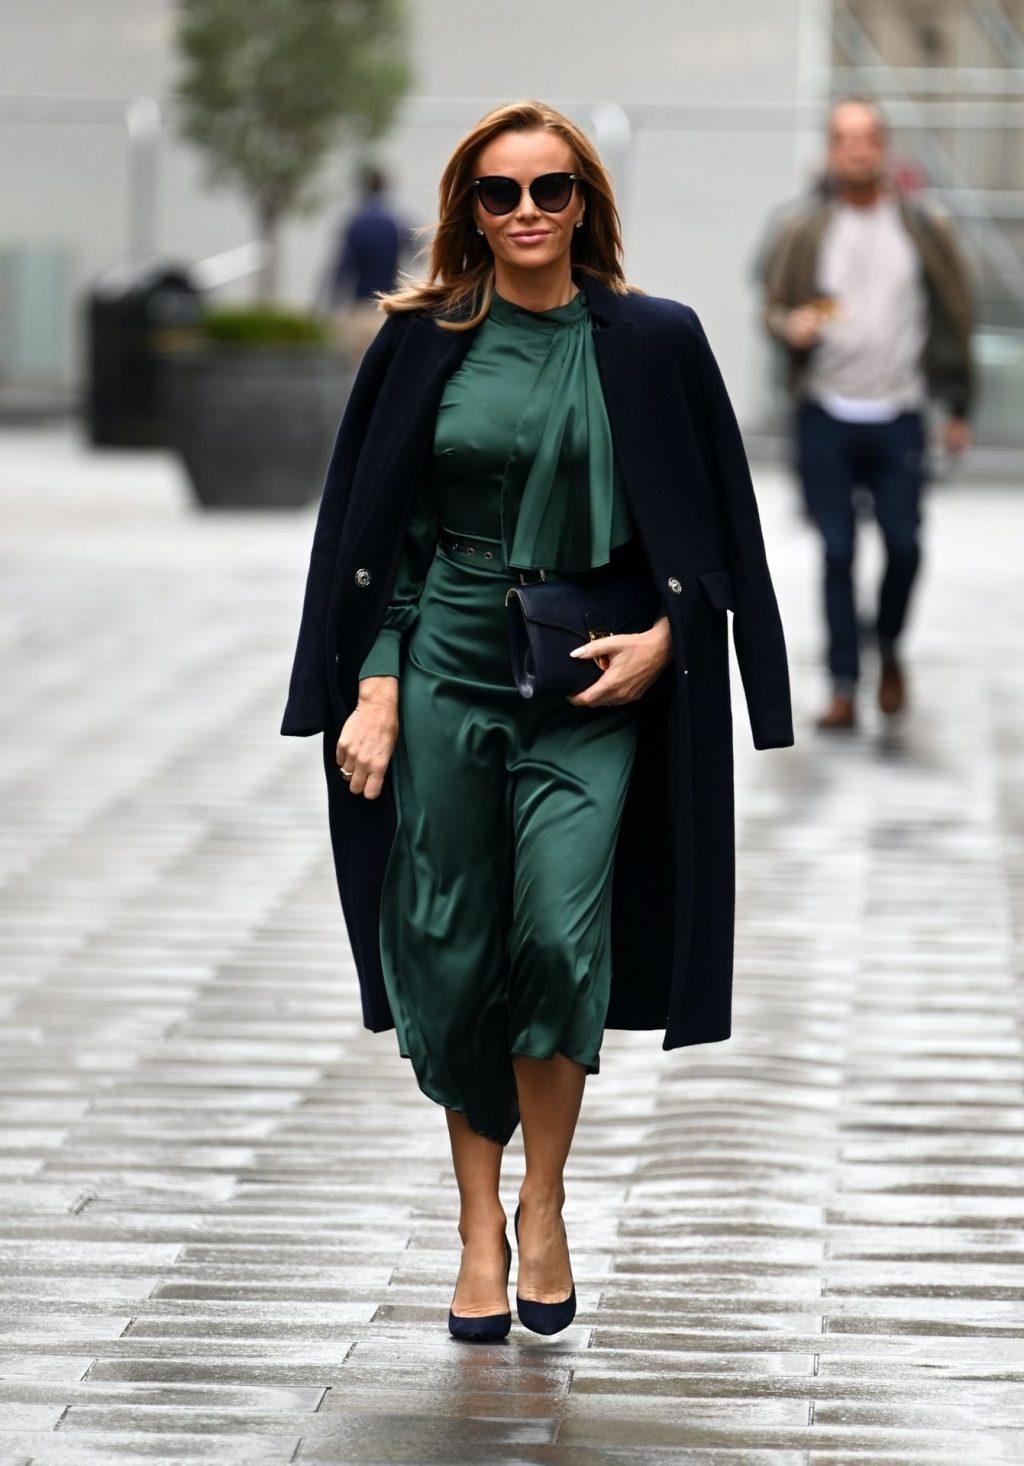 Amanda Holden is Seen Leaving the Global Studios (32 Photos)